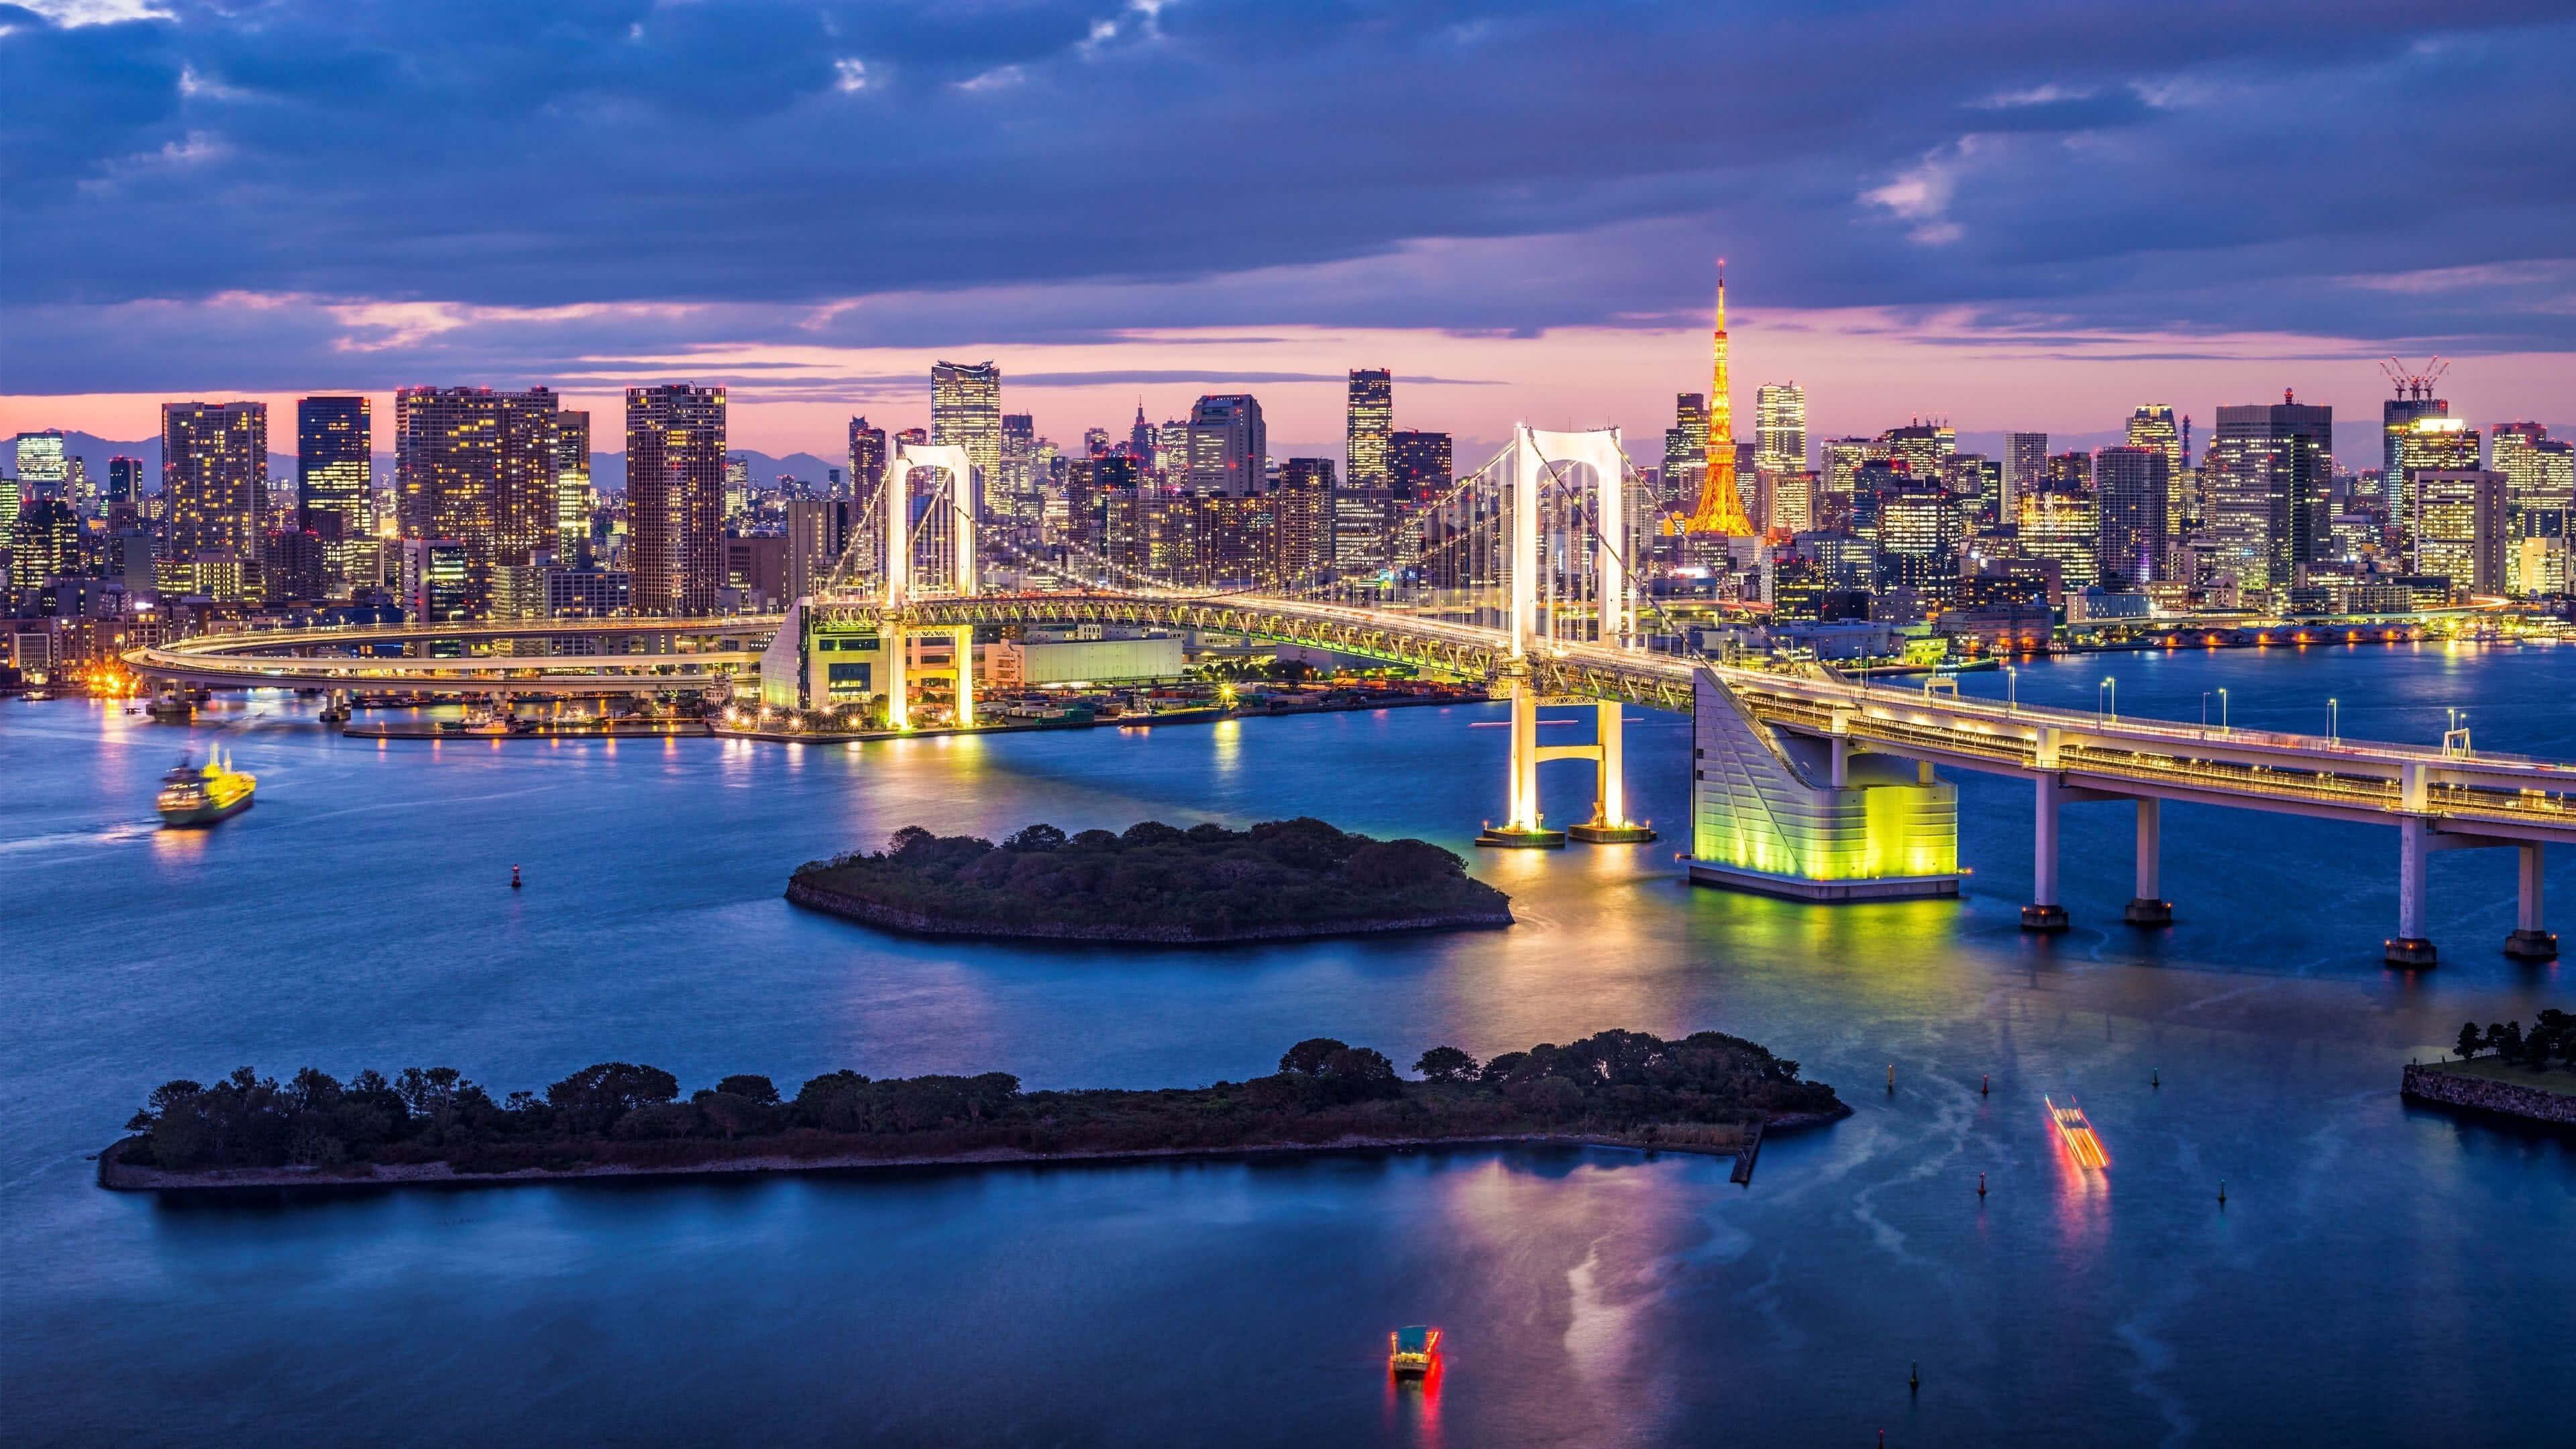 Rainbow Bridge Tokyo 4k Ultrahd Wallpaper